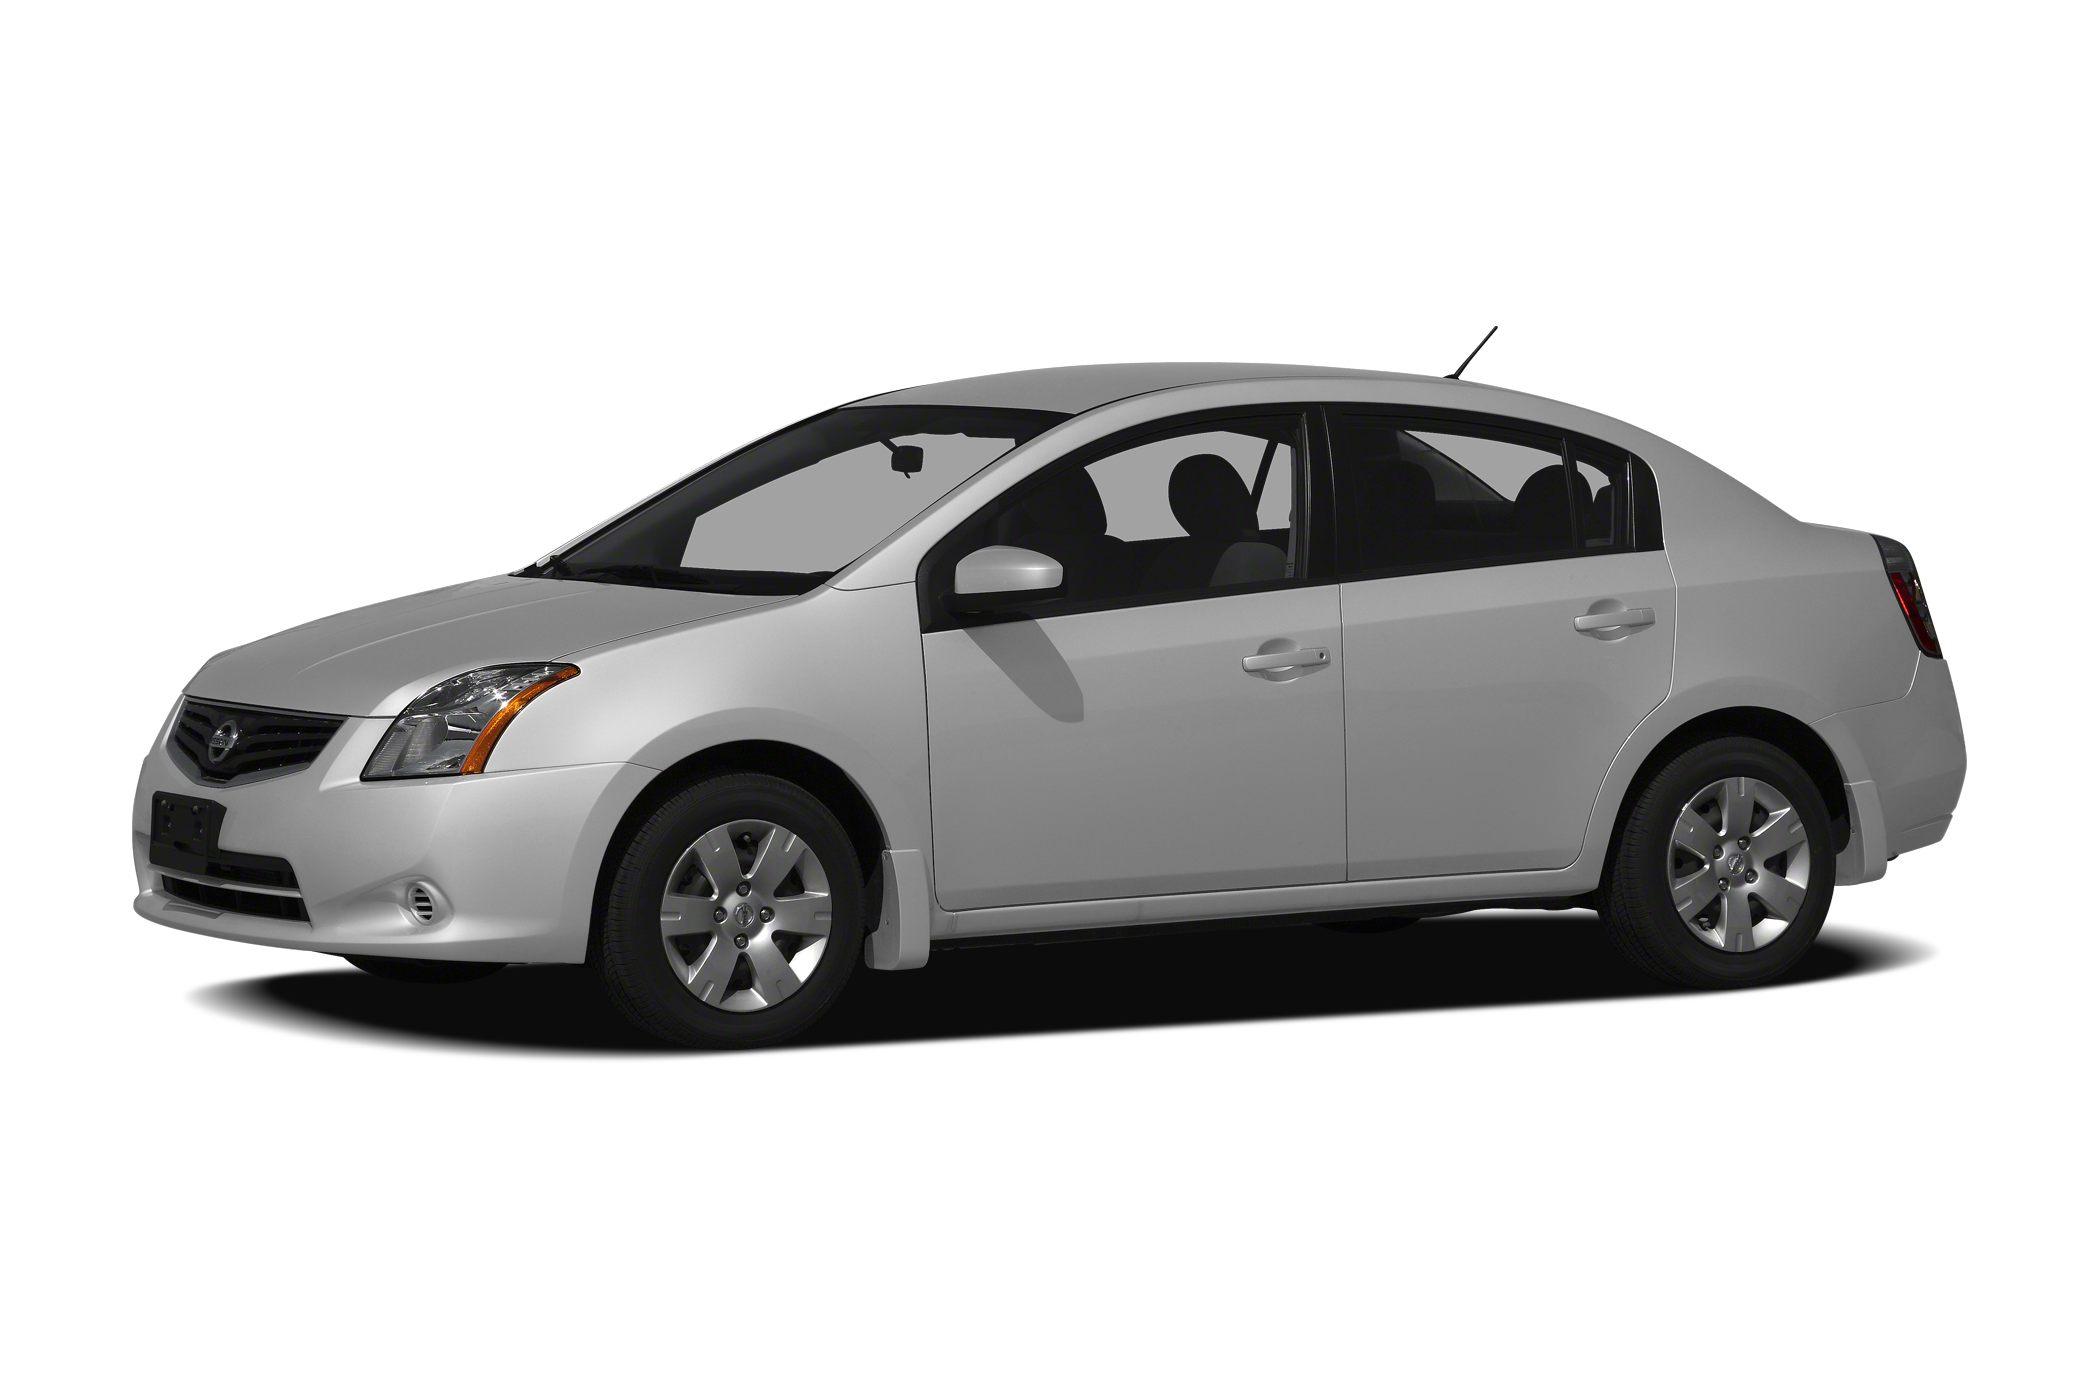 Grey Nissan Sentra